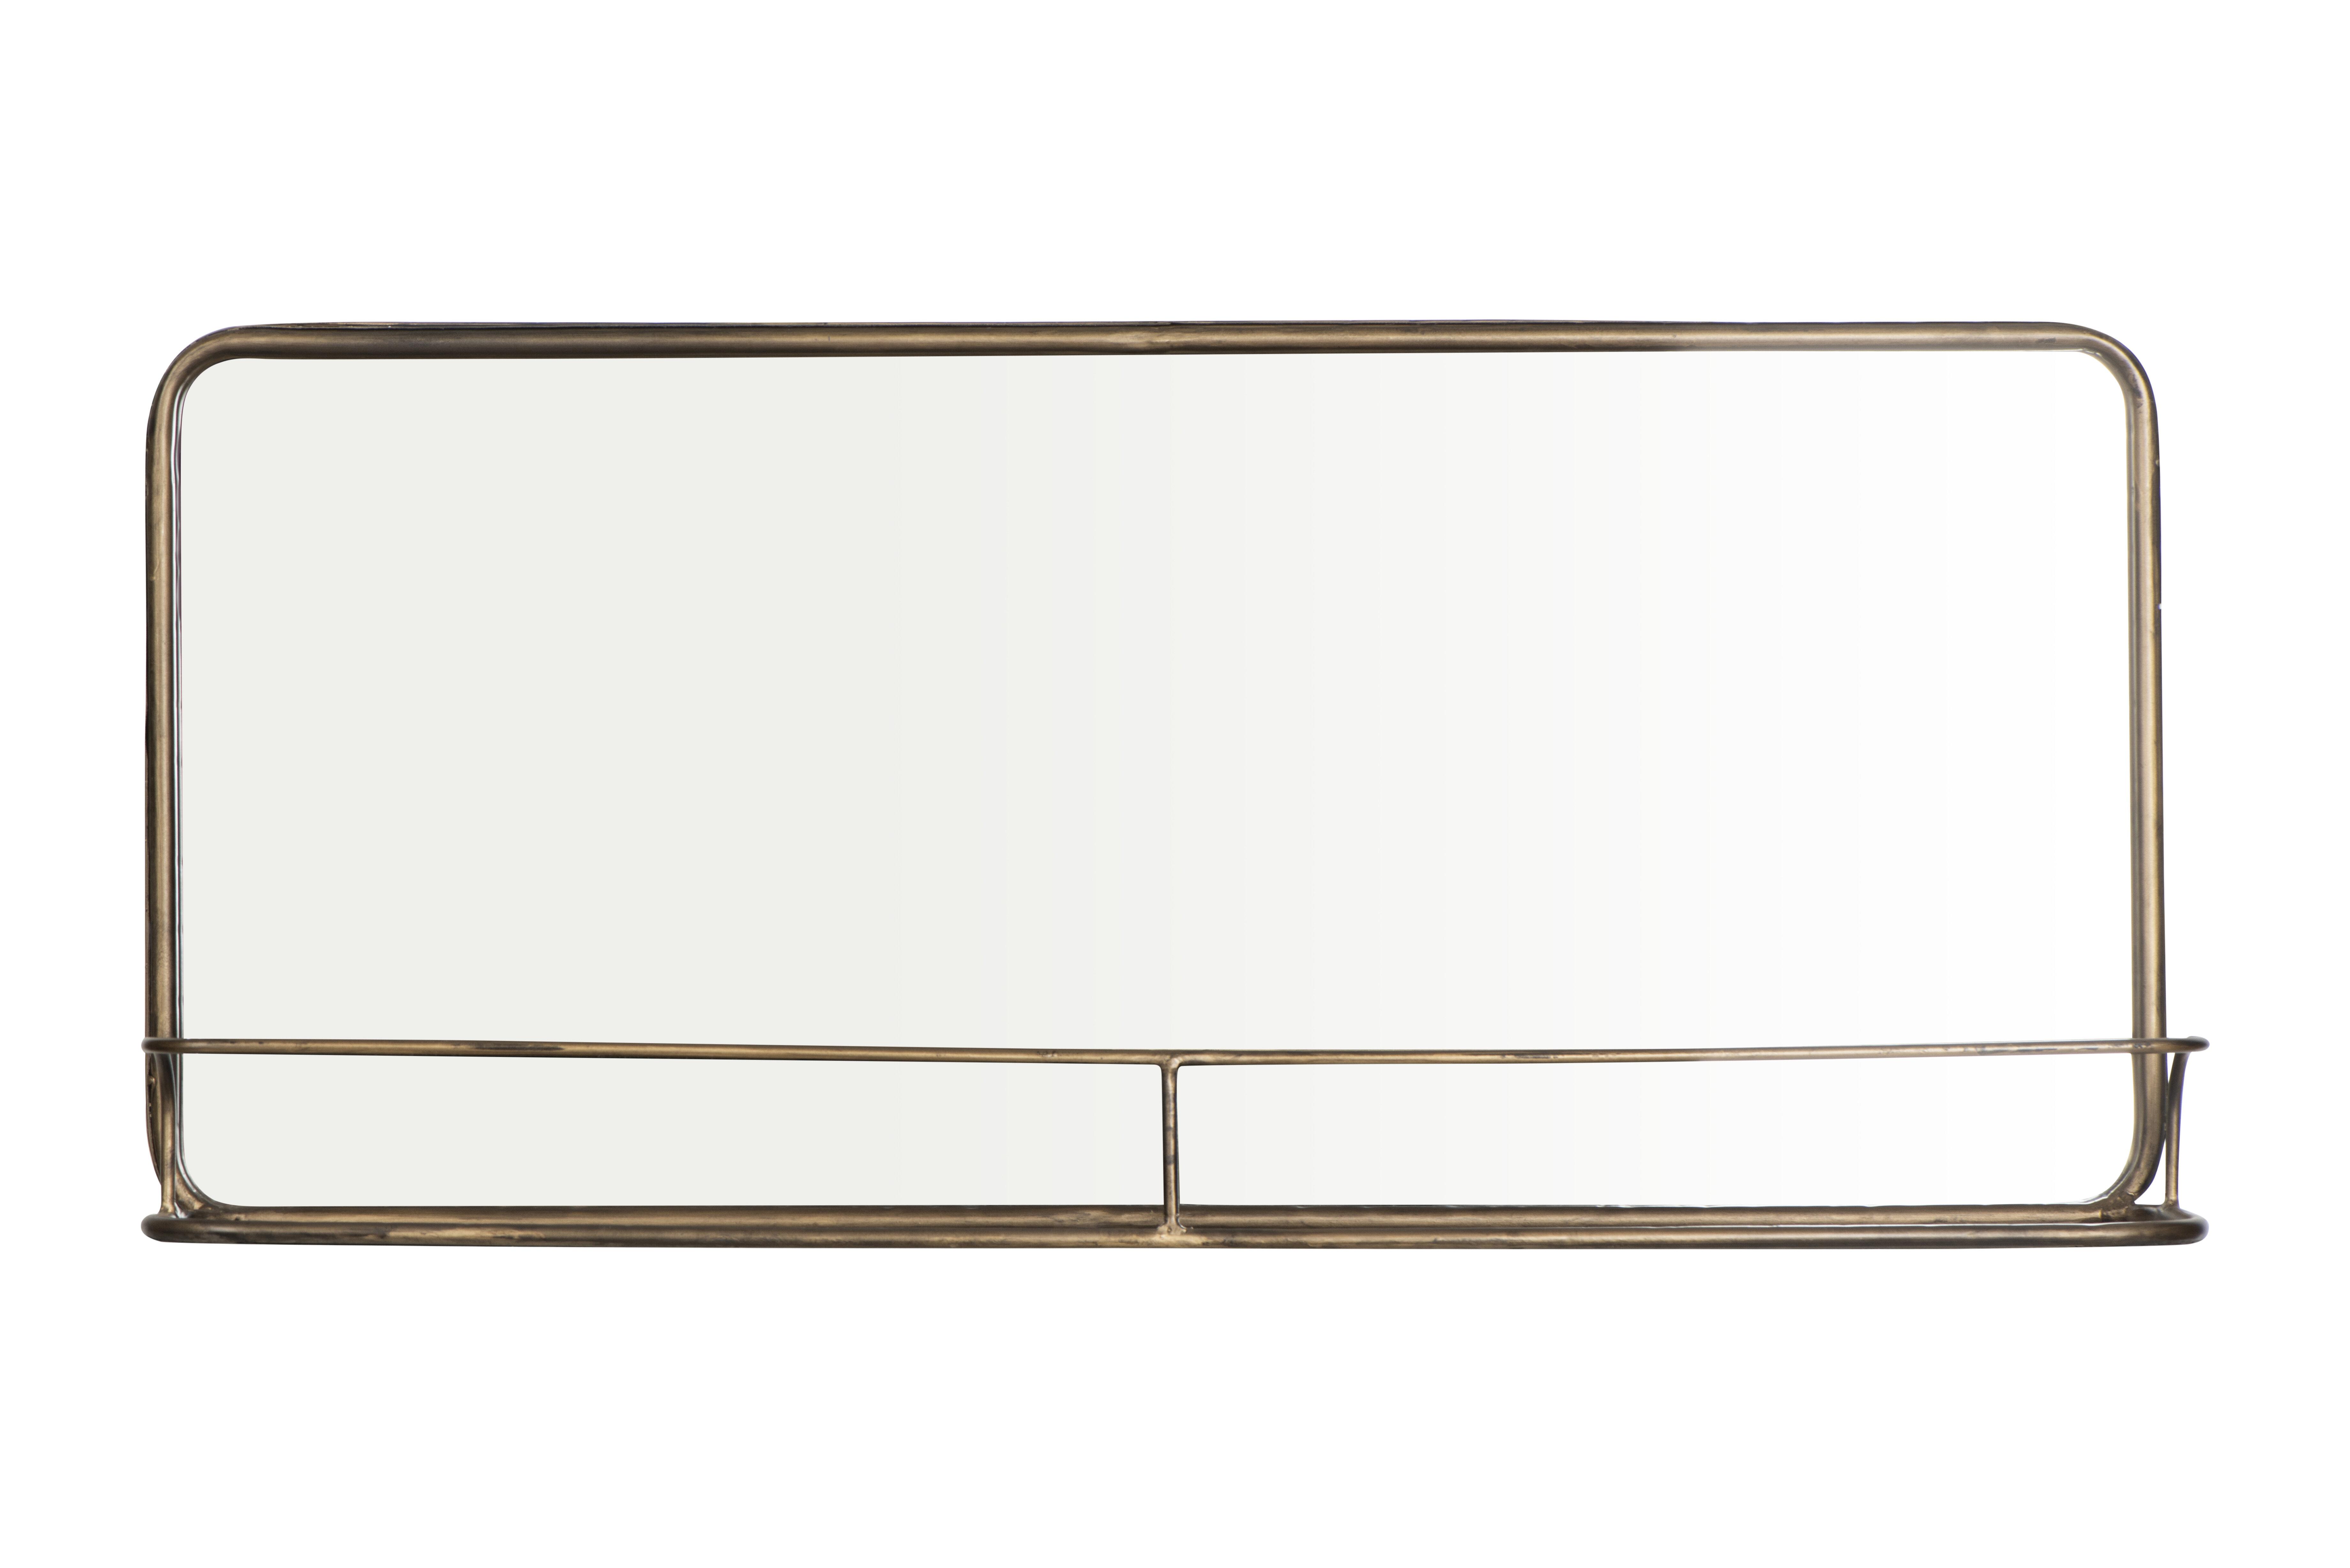 Peetz Modern Rustic Accent Mirror For Peetz Modern Rustic Accent Mirrors (Image 22 of 30)